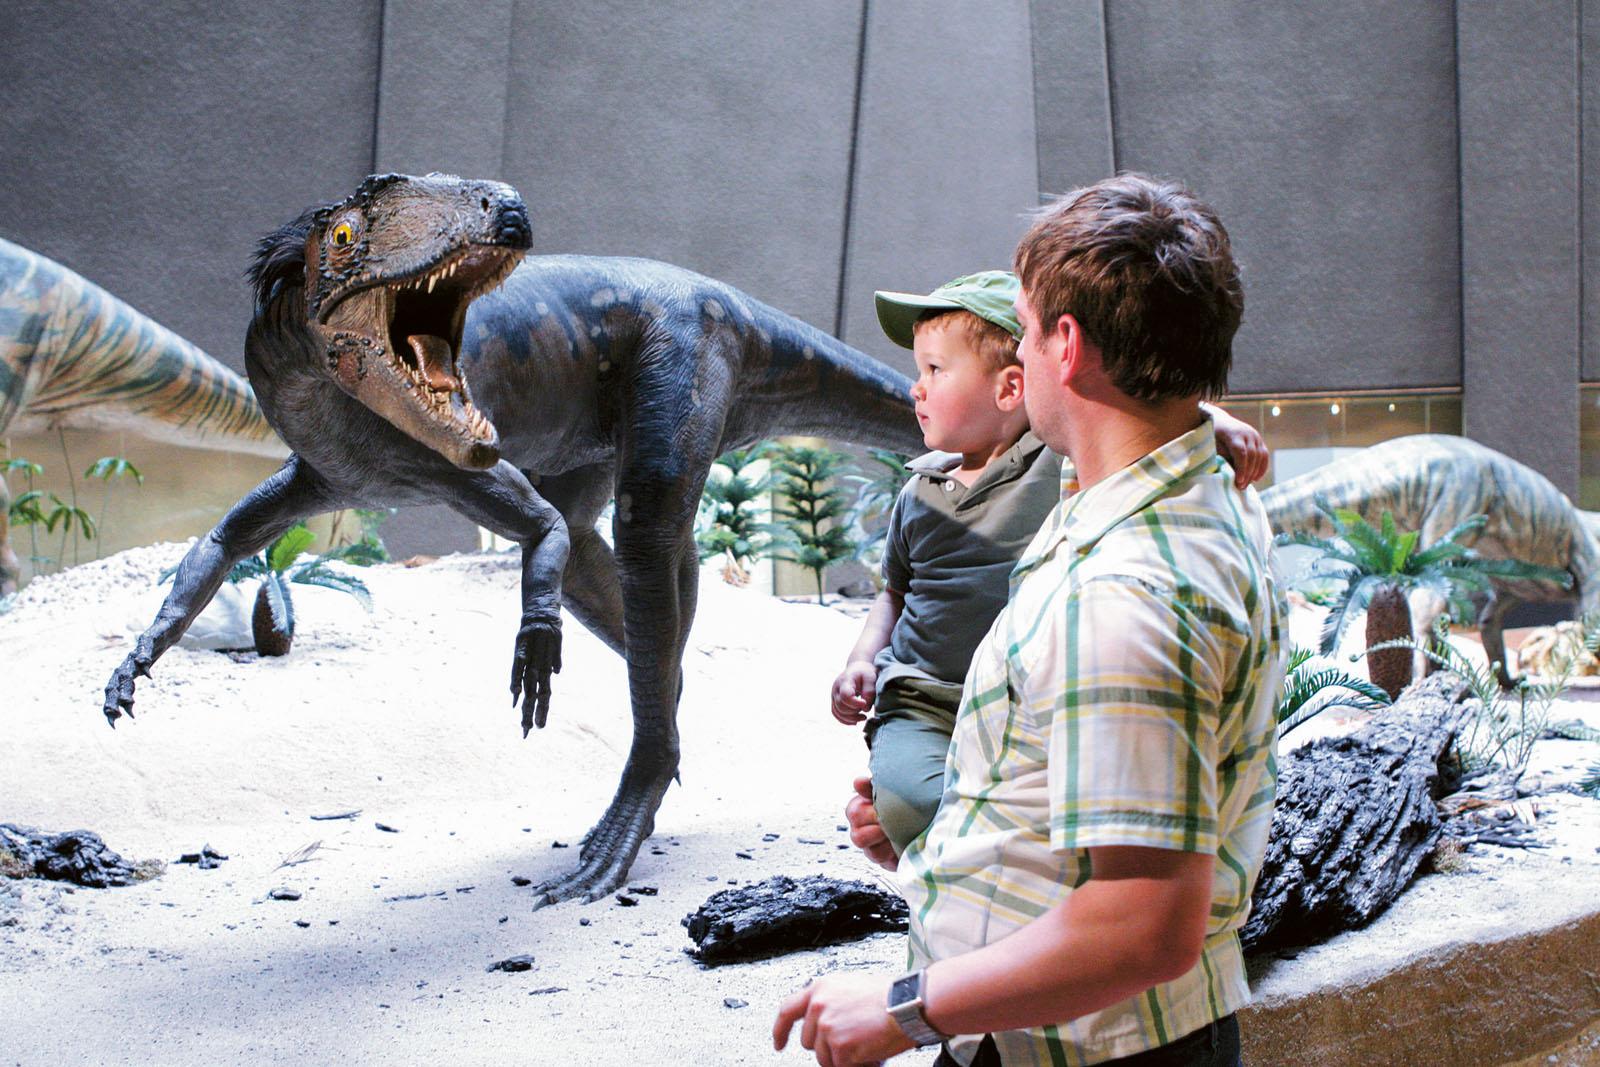 Lange Nacht der Museen Stuttgart - Museum am Löwentor Dinosaurier